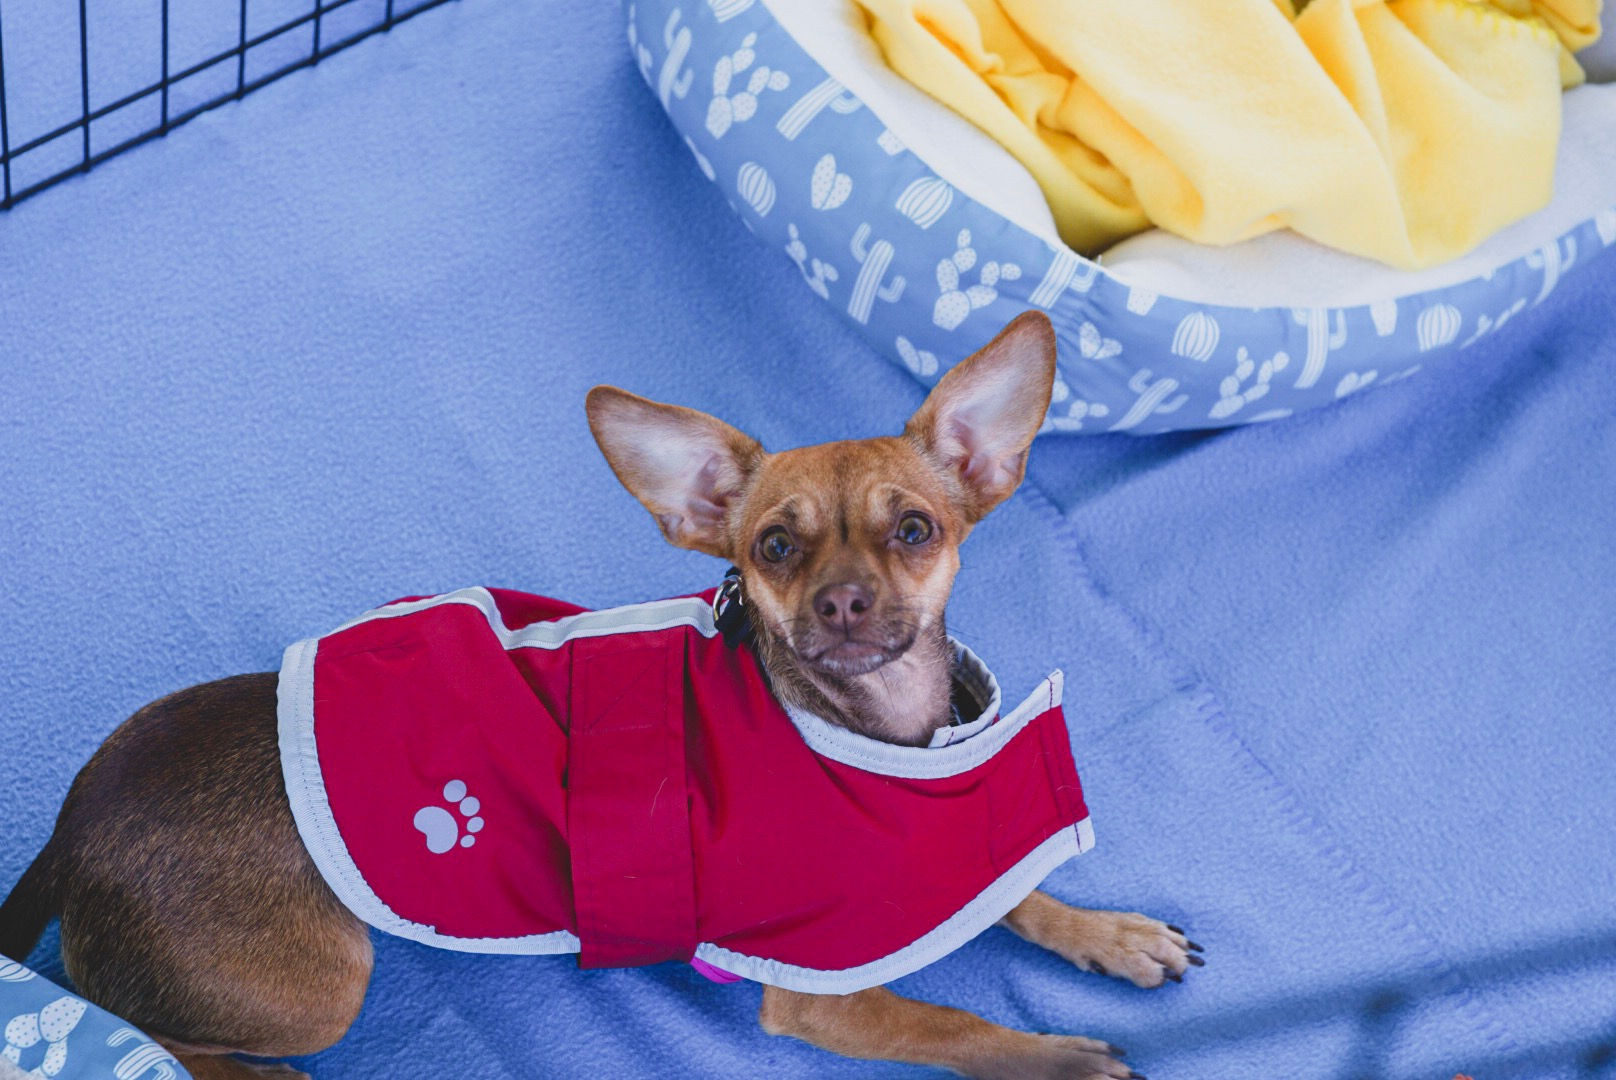 TVF_adoptdog.JPG